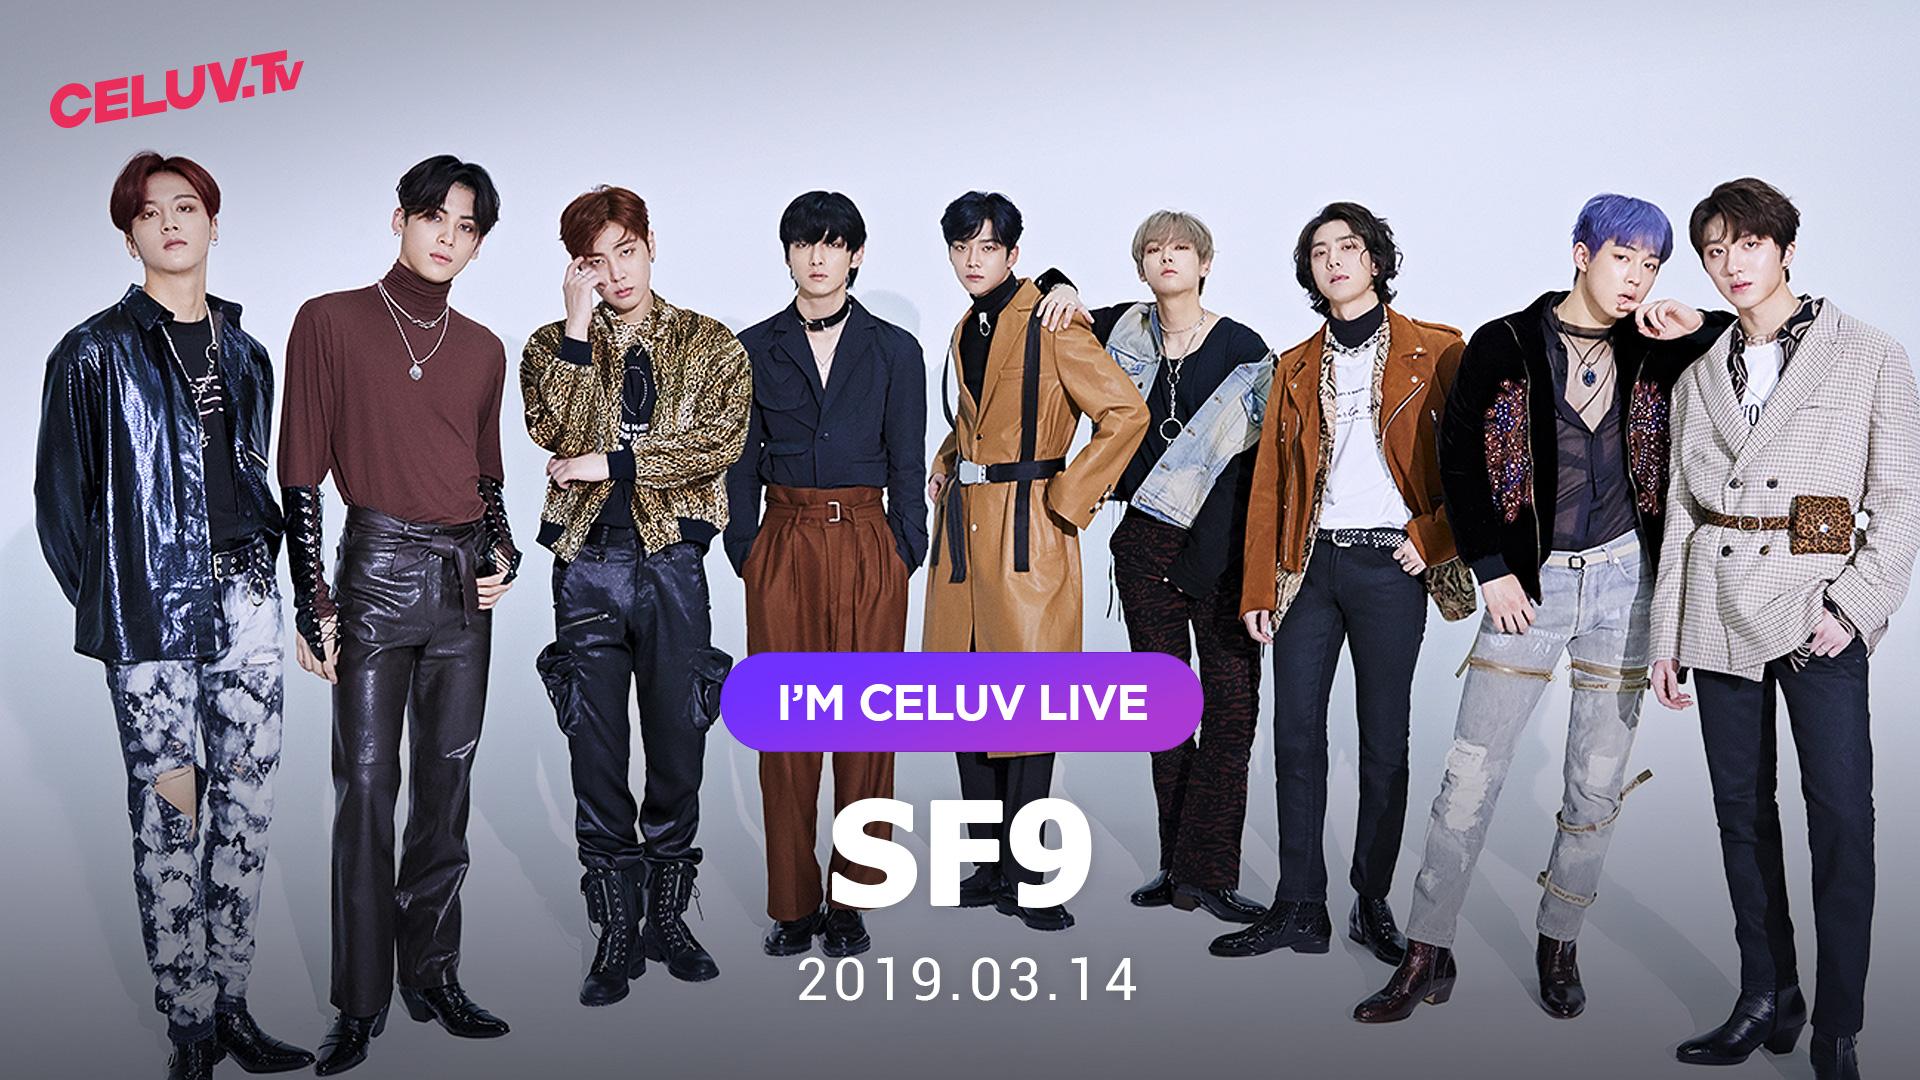 [I'm Celuv] SF9(에스에프나인), 어딜 가나 눈에 띄는~(Celuv.TV)